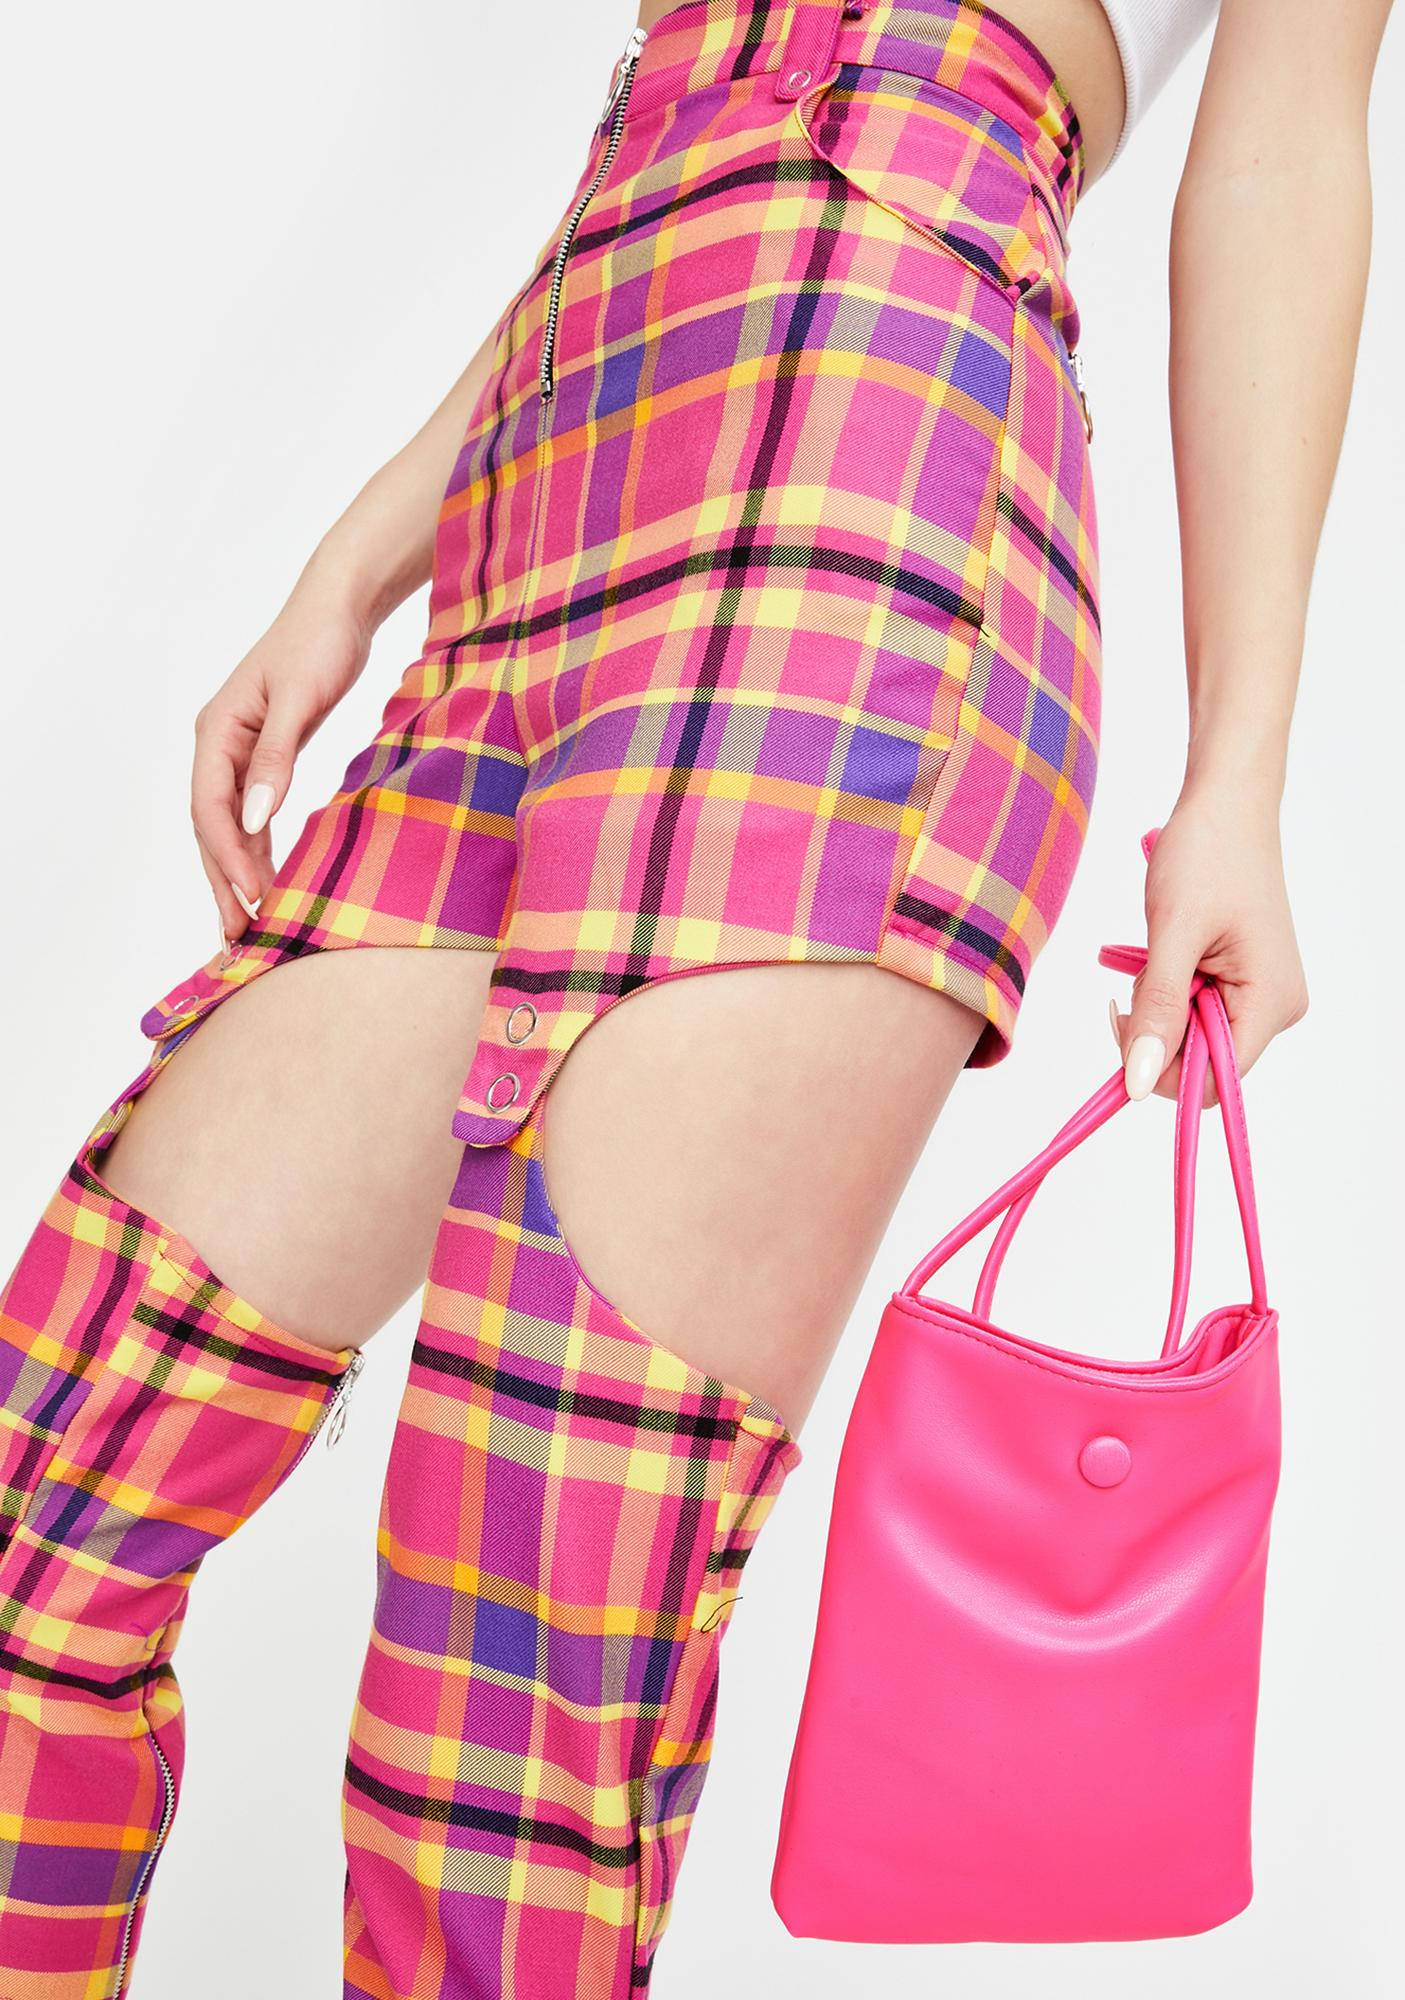 Baby Send It Neon Tote Bag